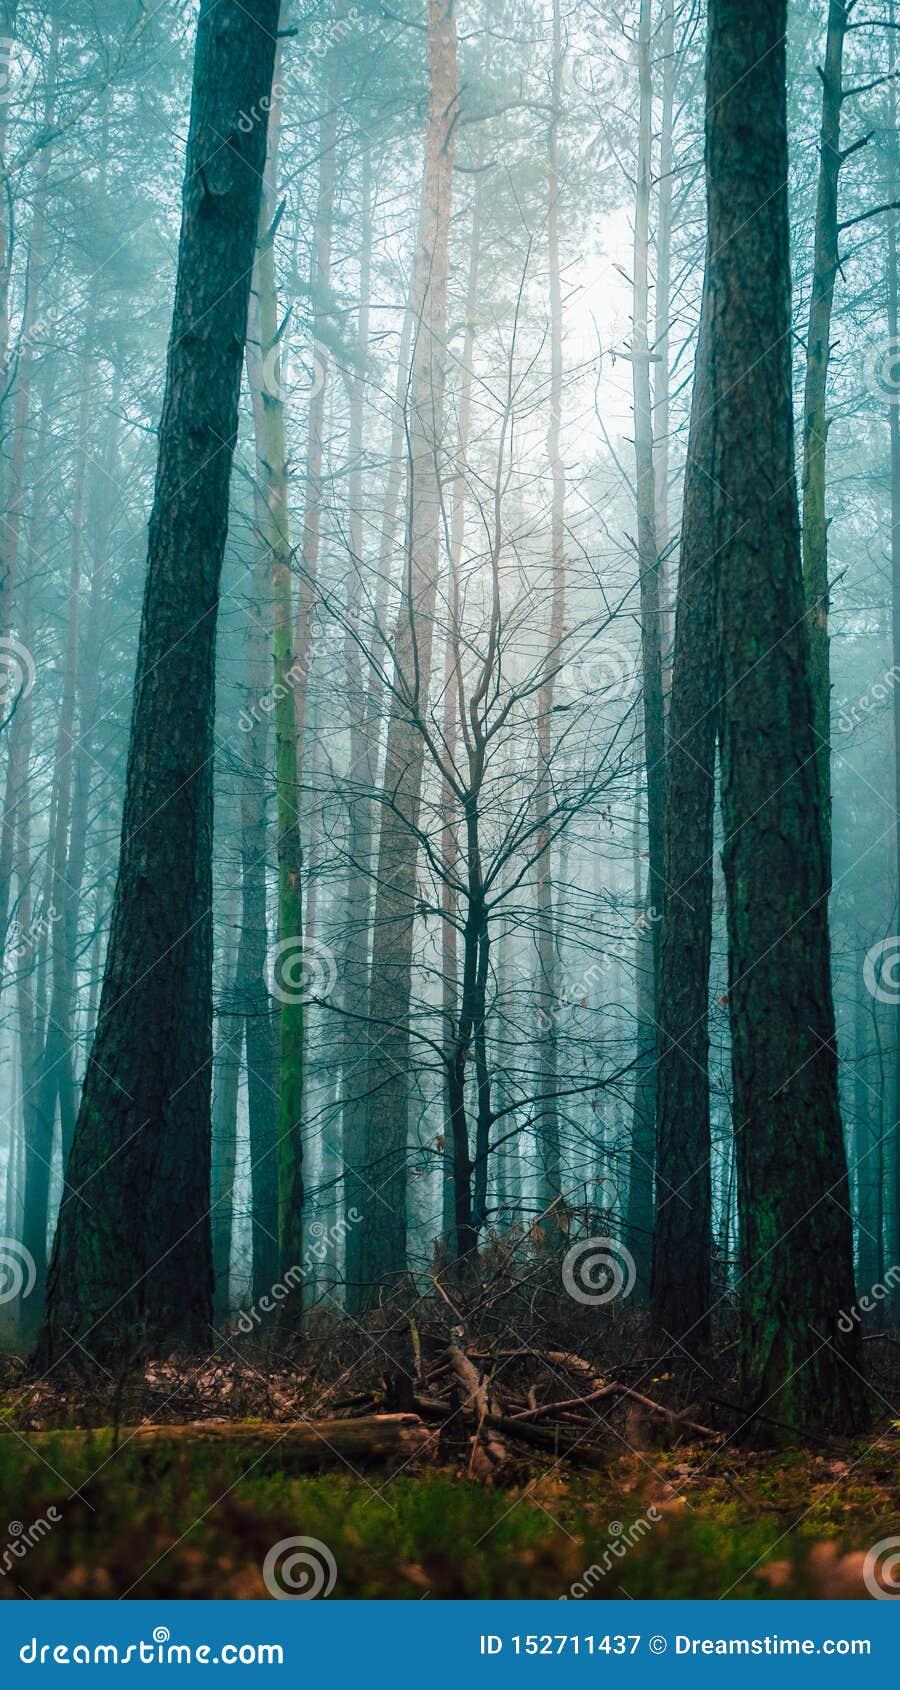 Dimmigt träd i lynnig skog